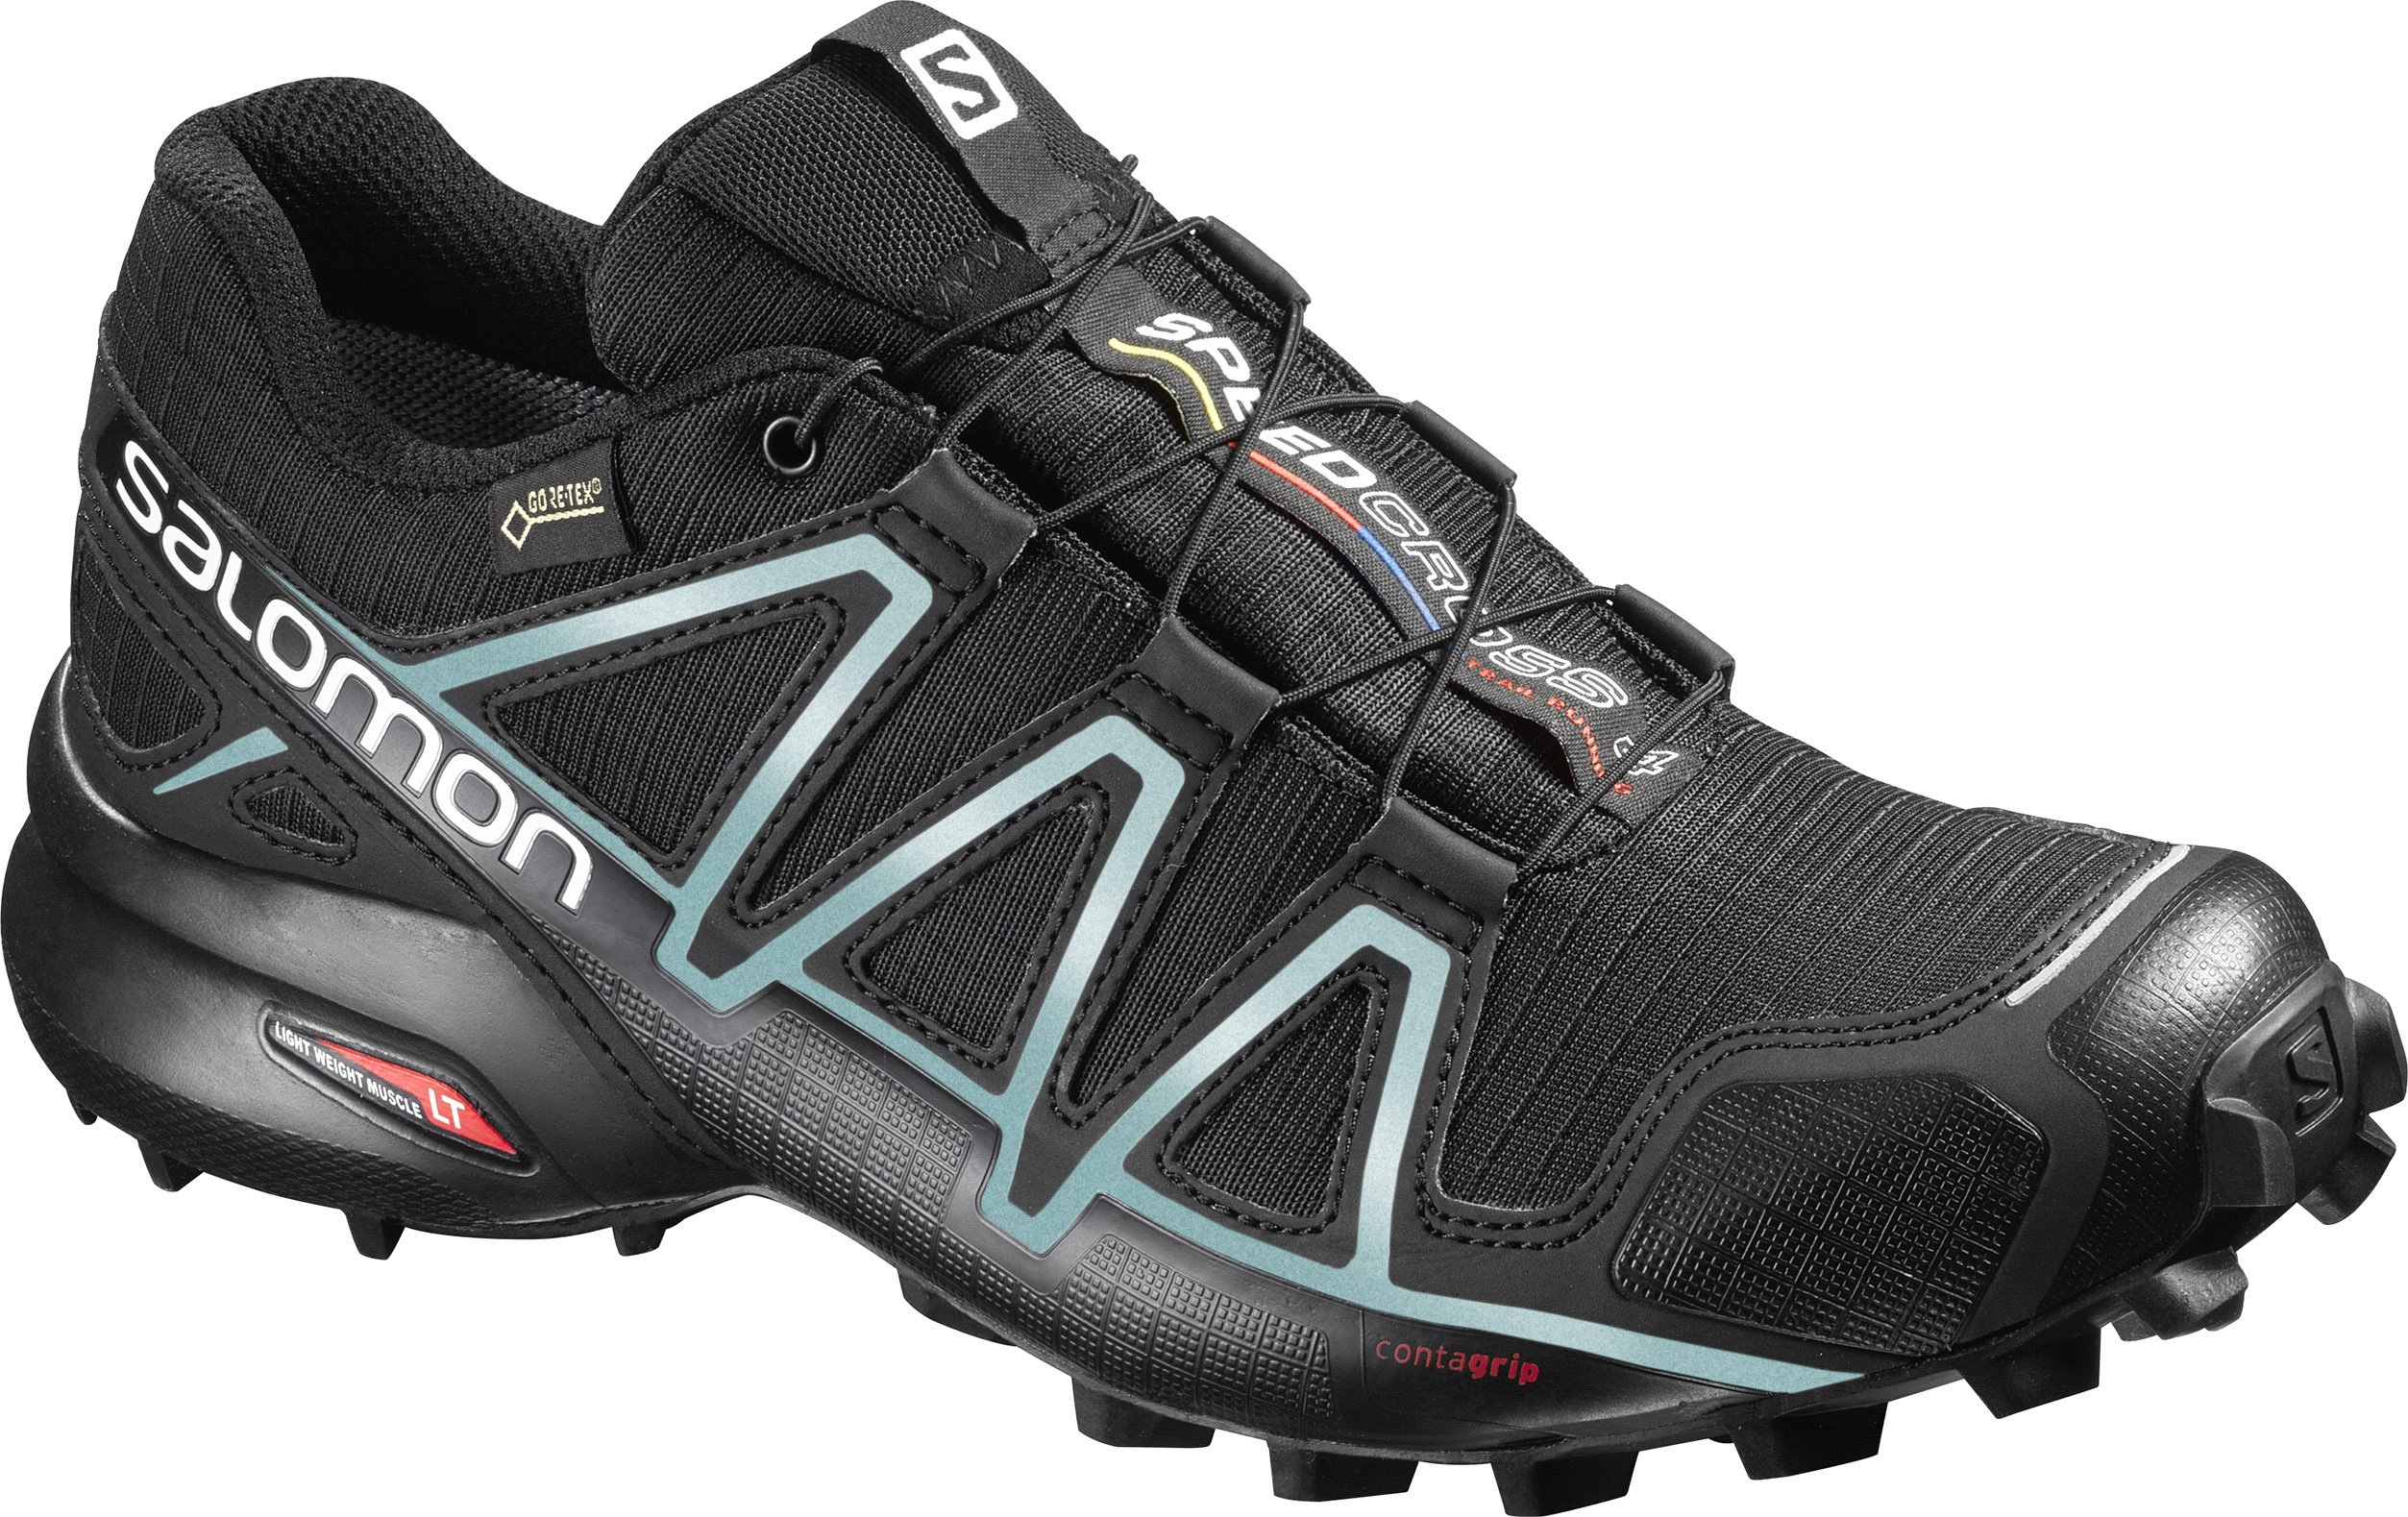 Trailové topánky Salomon SPEEDCROSS 4 GTX W BLACK BK Metallic B ... 3192f42d247